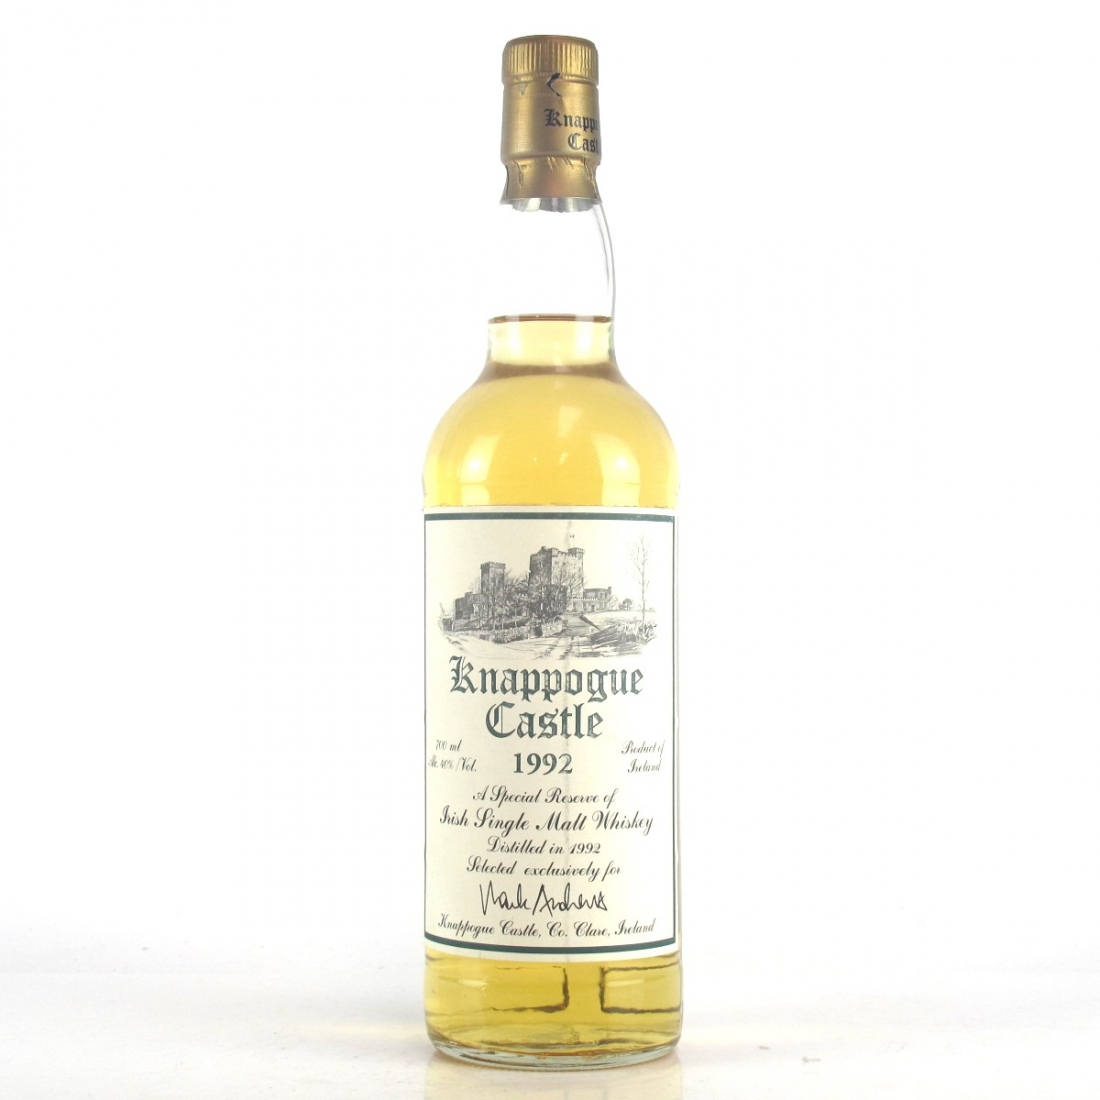 Knappogue Castle 1992 Irish Single Malt